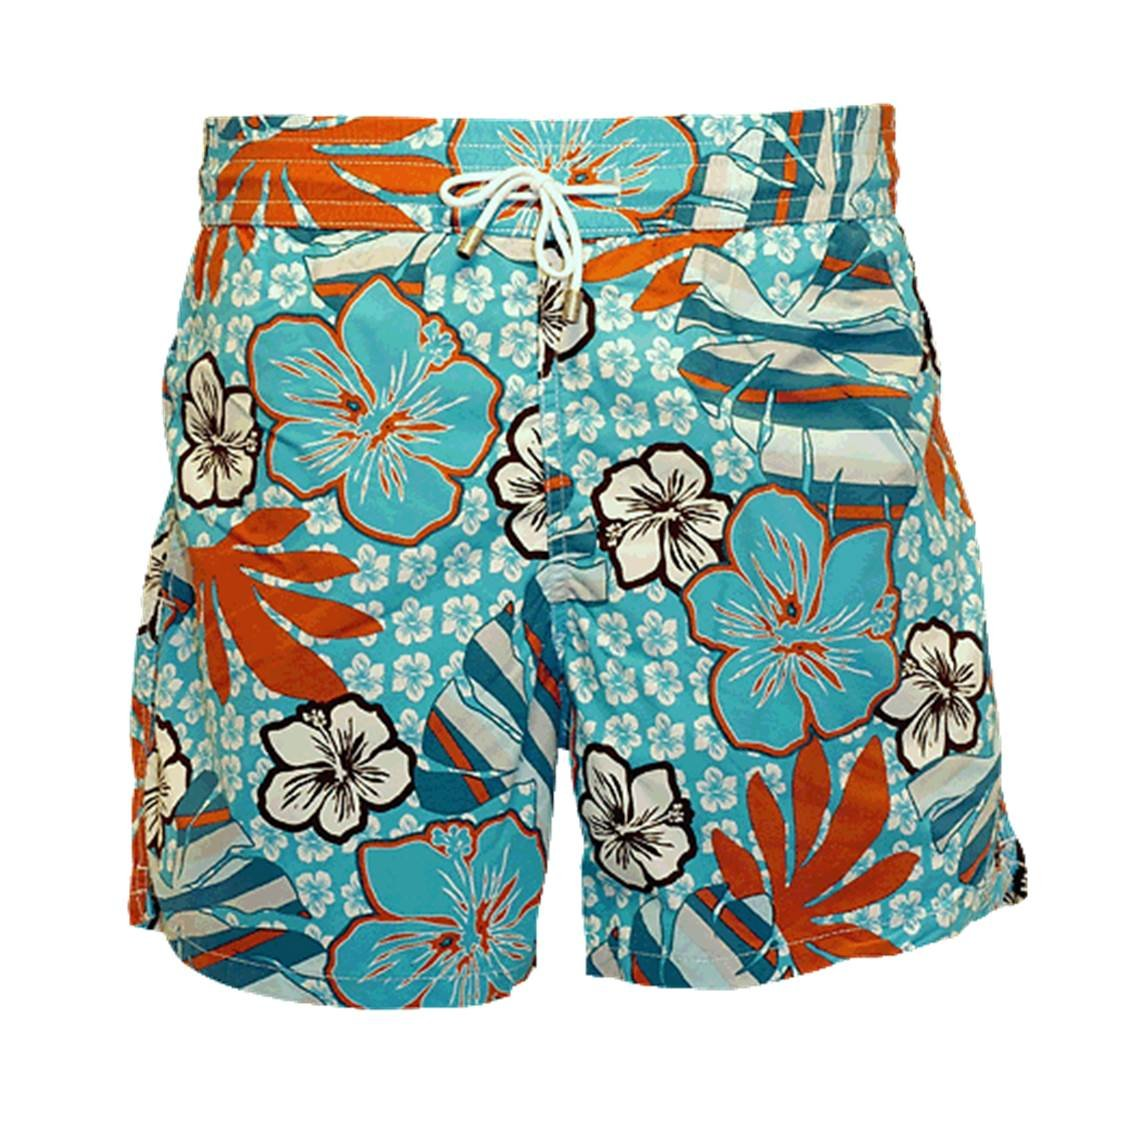 Bayahibe Men's Swim Short BAYA 8496/08 Large SkyBlue/Red Flowered Pattern